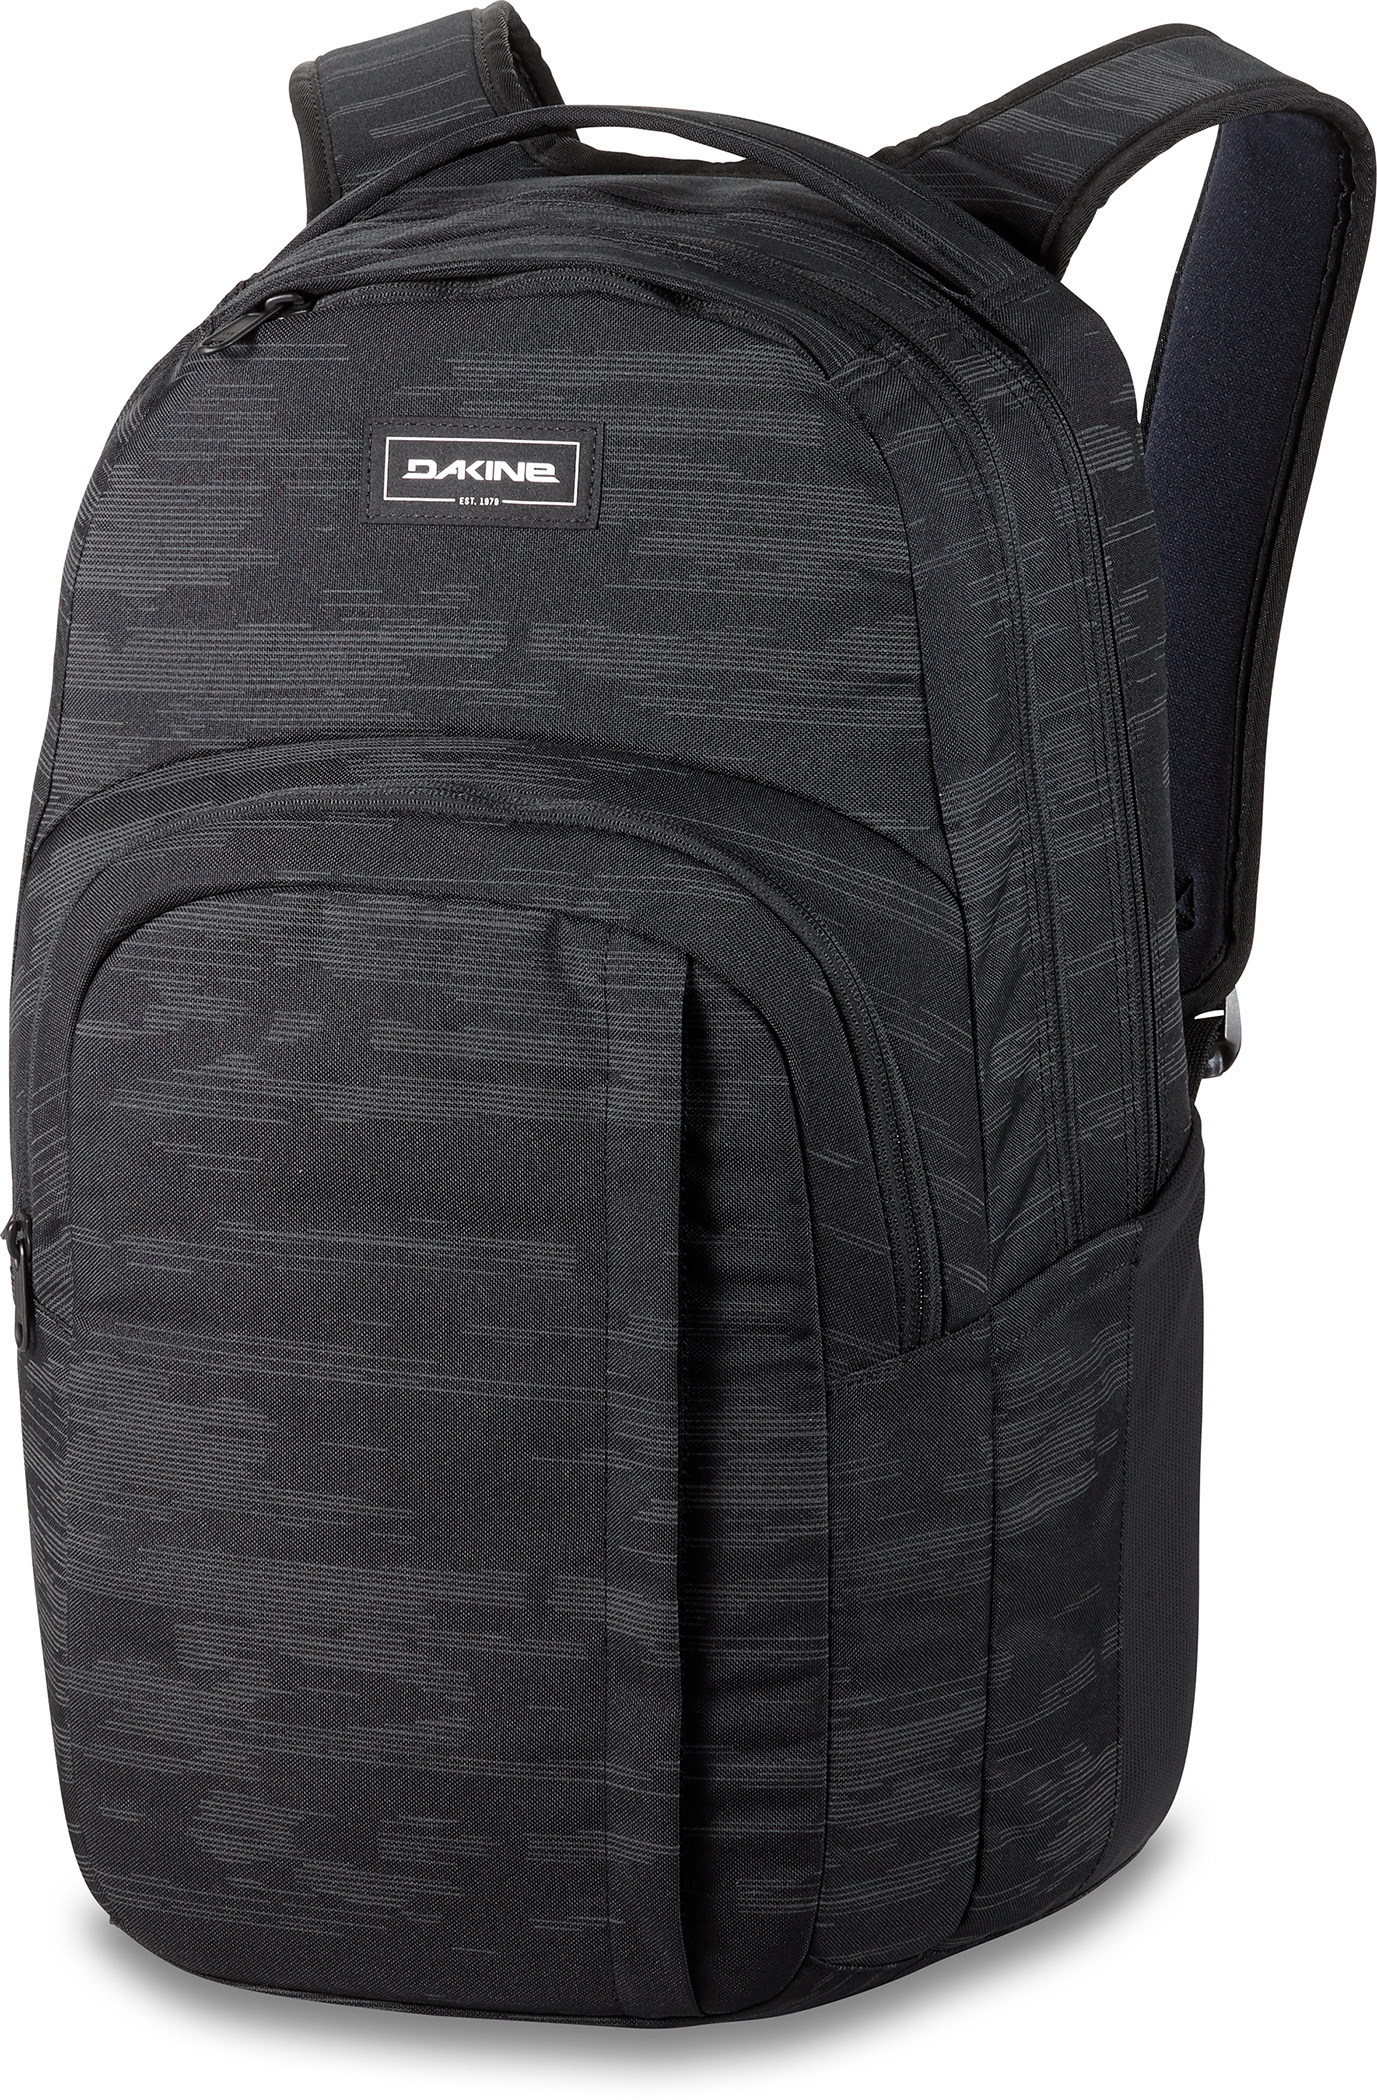 Dakine Backpack CAMPUS L 33L Flash Reflective